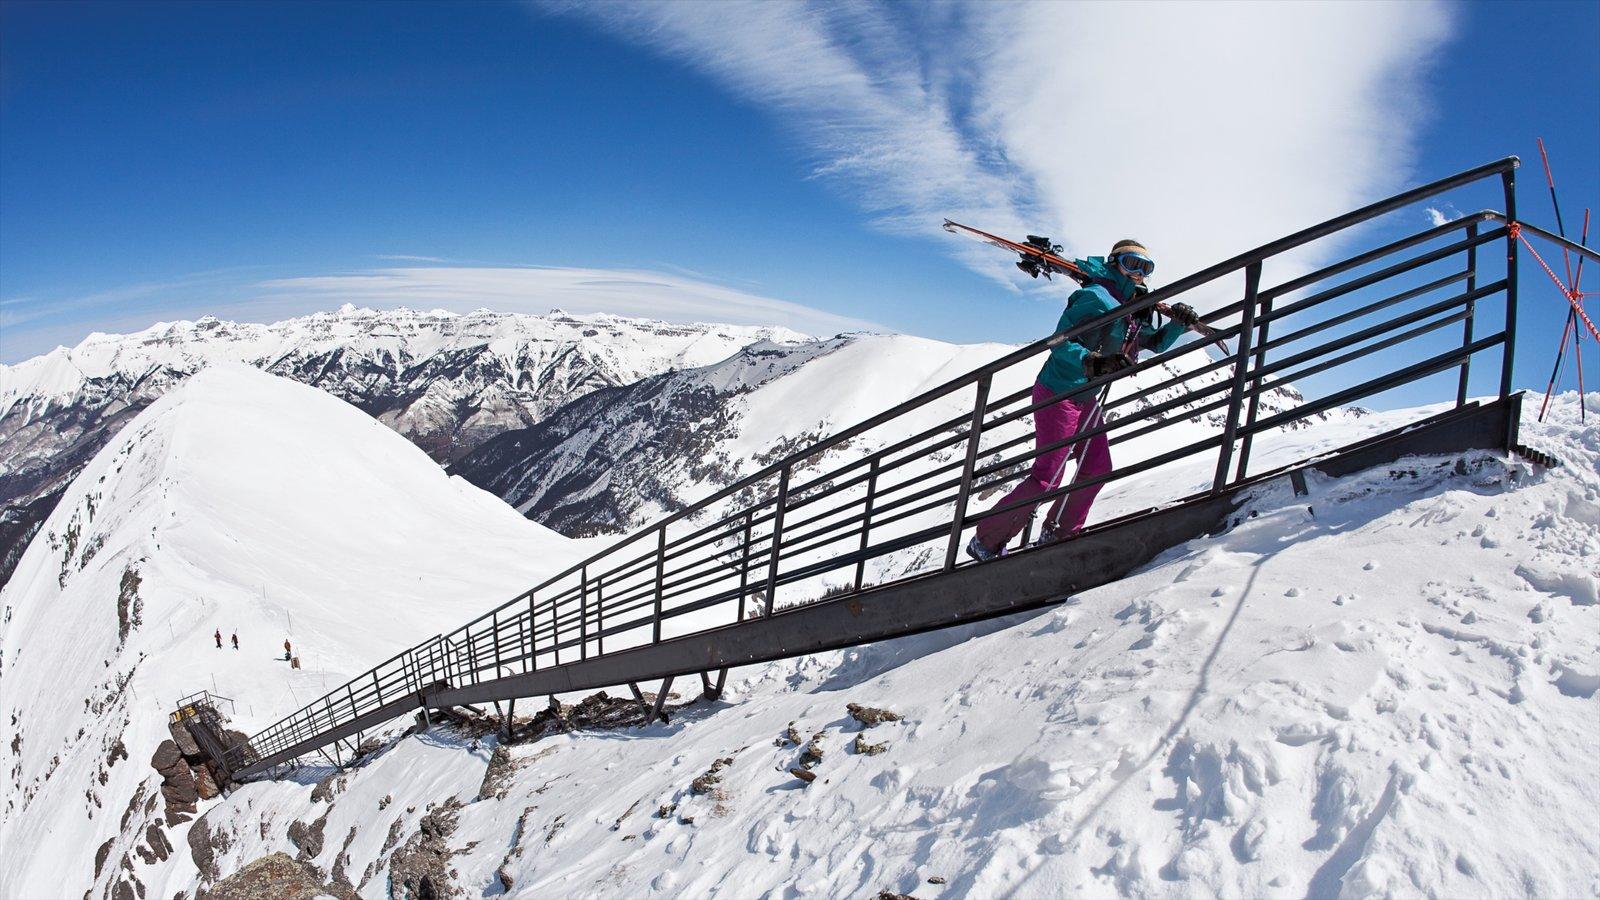 nature pictures: view images of telluride ski resort